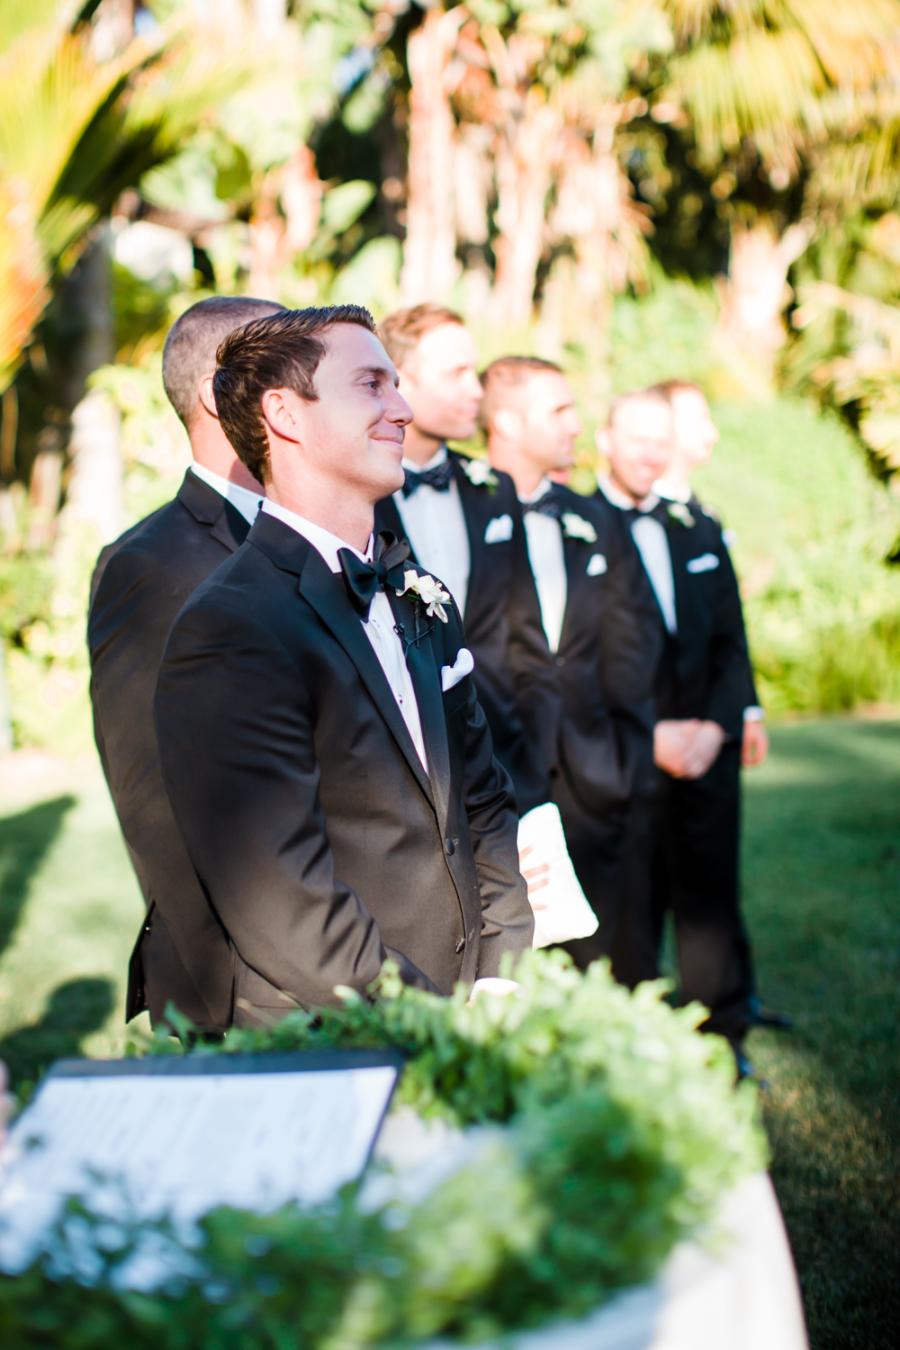 www.santabarbarawedding.com | Ann Johnson Events | Jessica Lewis | The Biltmore | Groom at Ceremony